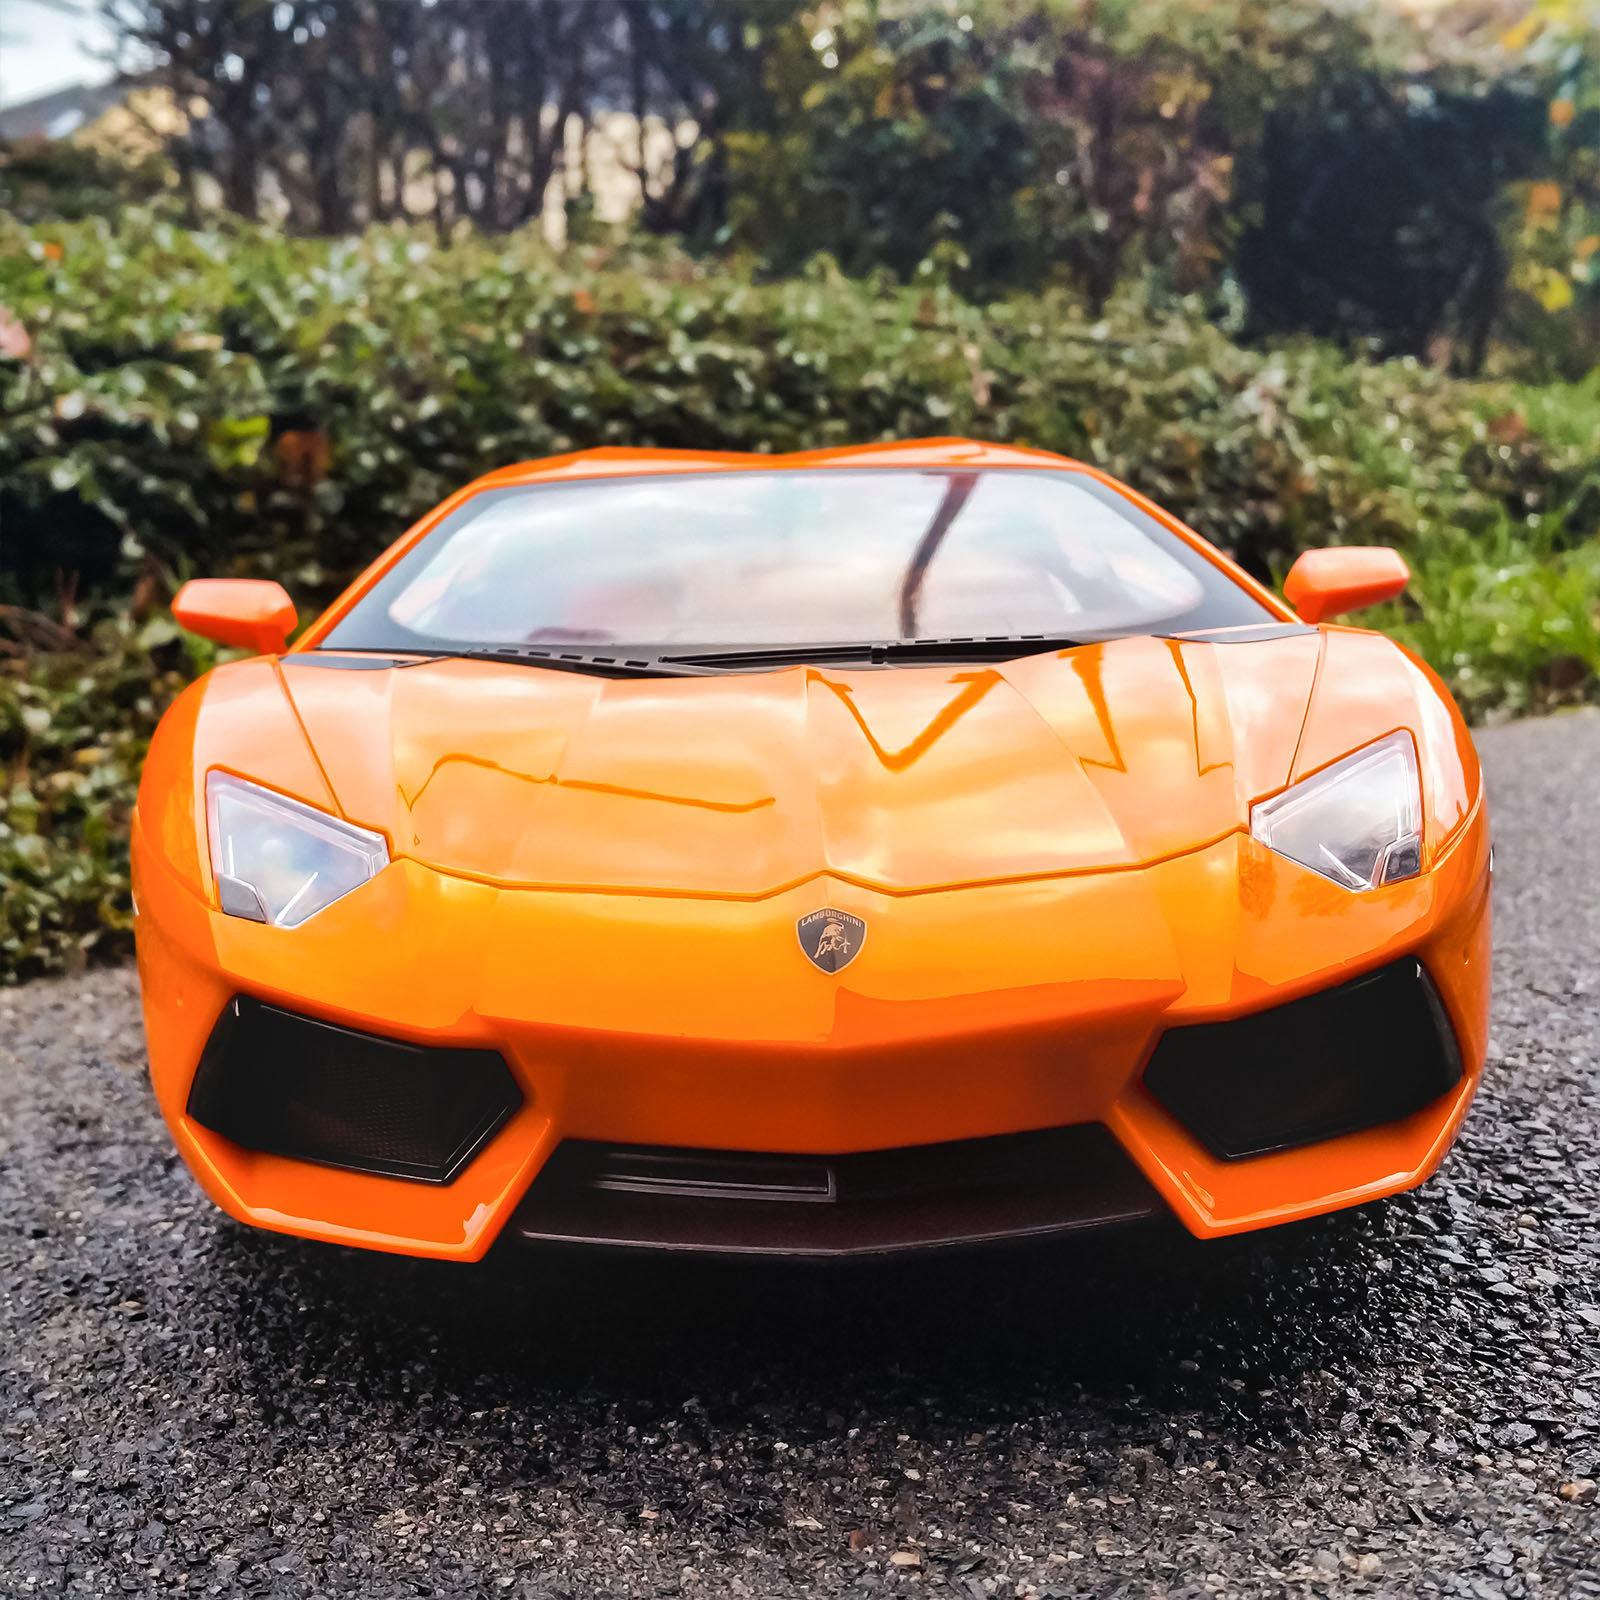 RC ferngesteuertes Auto XXL Lamborghini Aventador Modellauto Lizensauto LP700-4